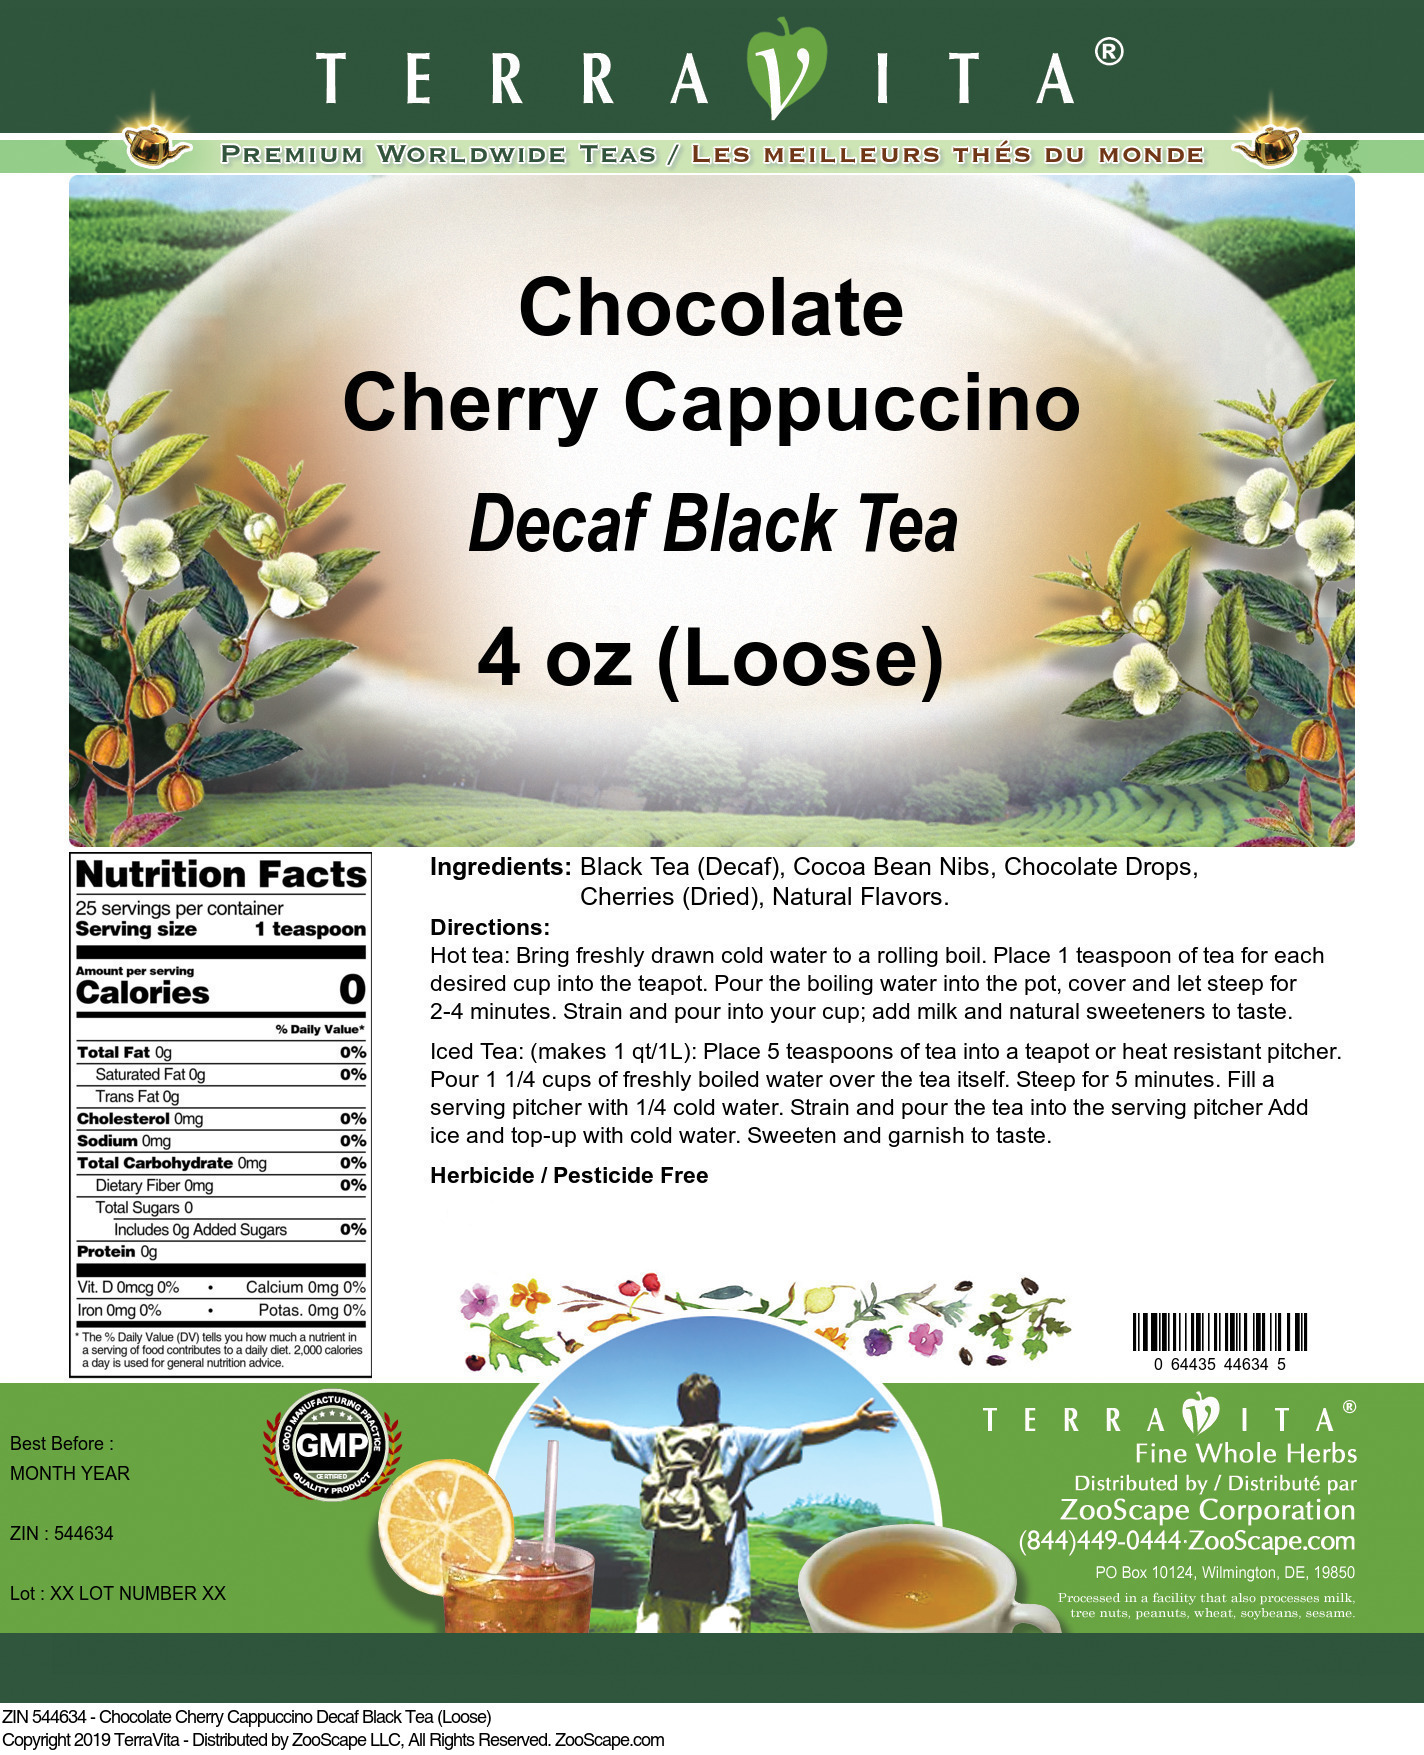 Chocolate Cherry Cappuccino Decaf Black Tea (Loose)